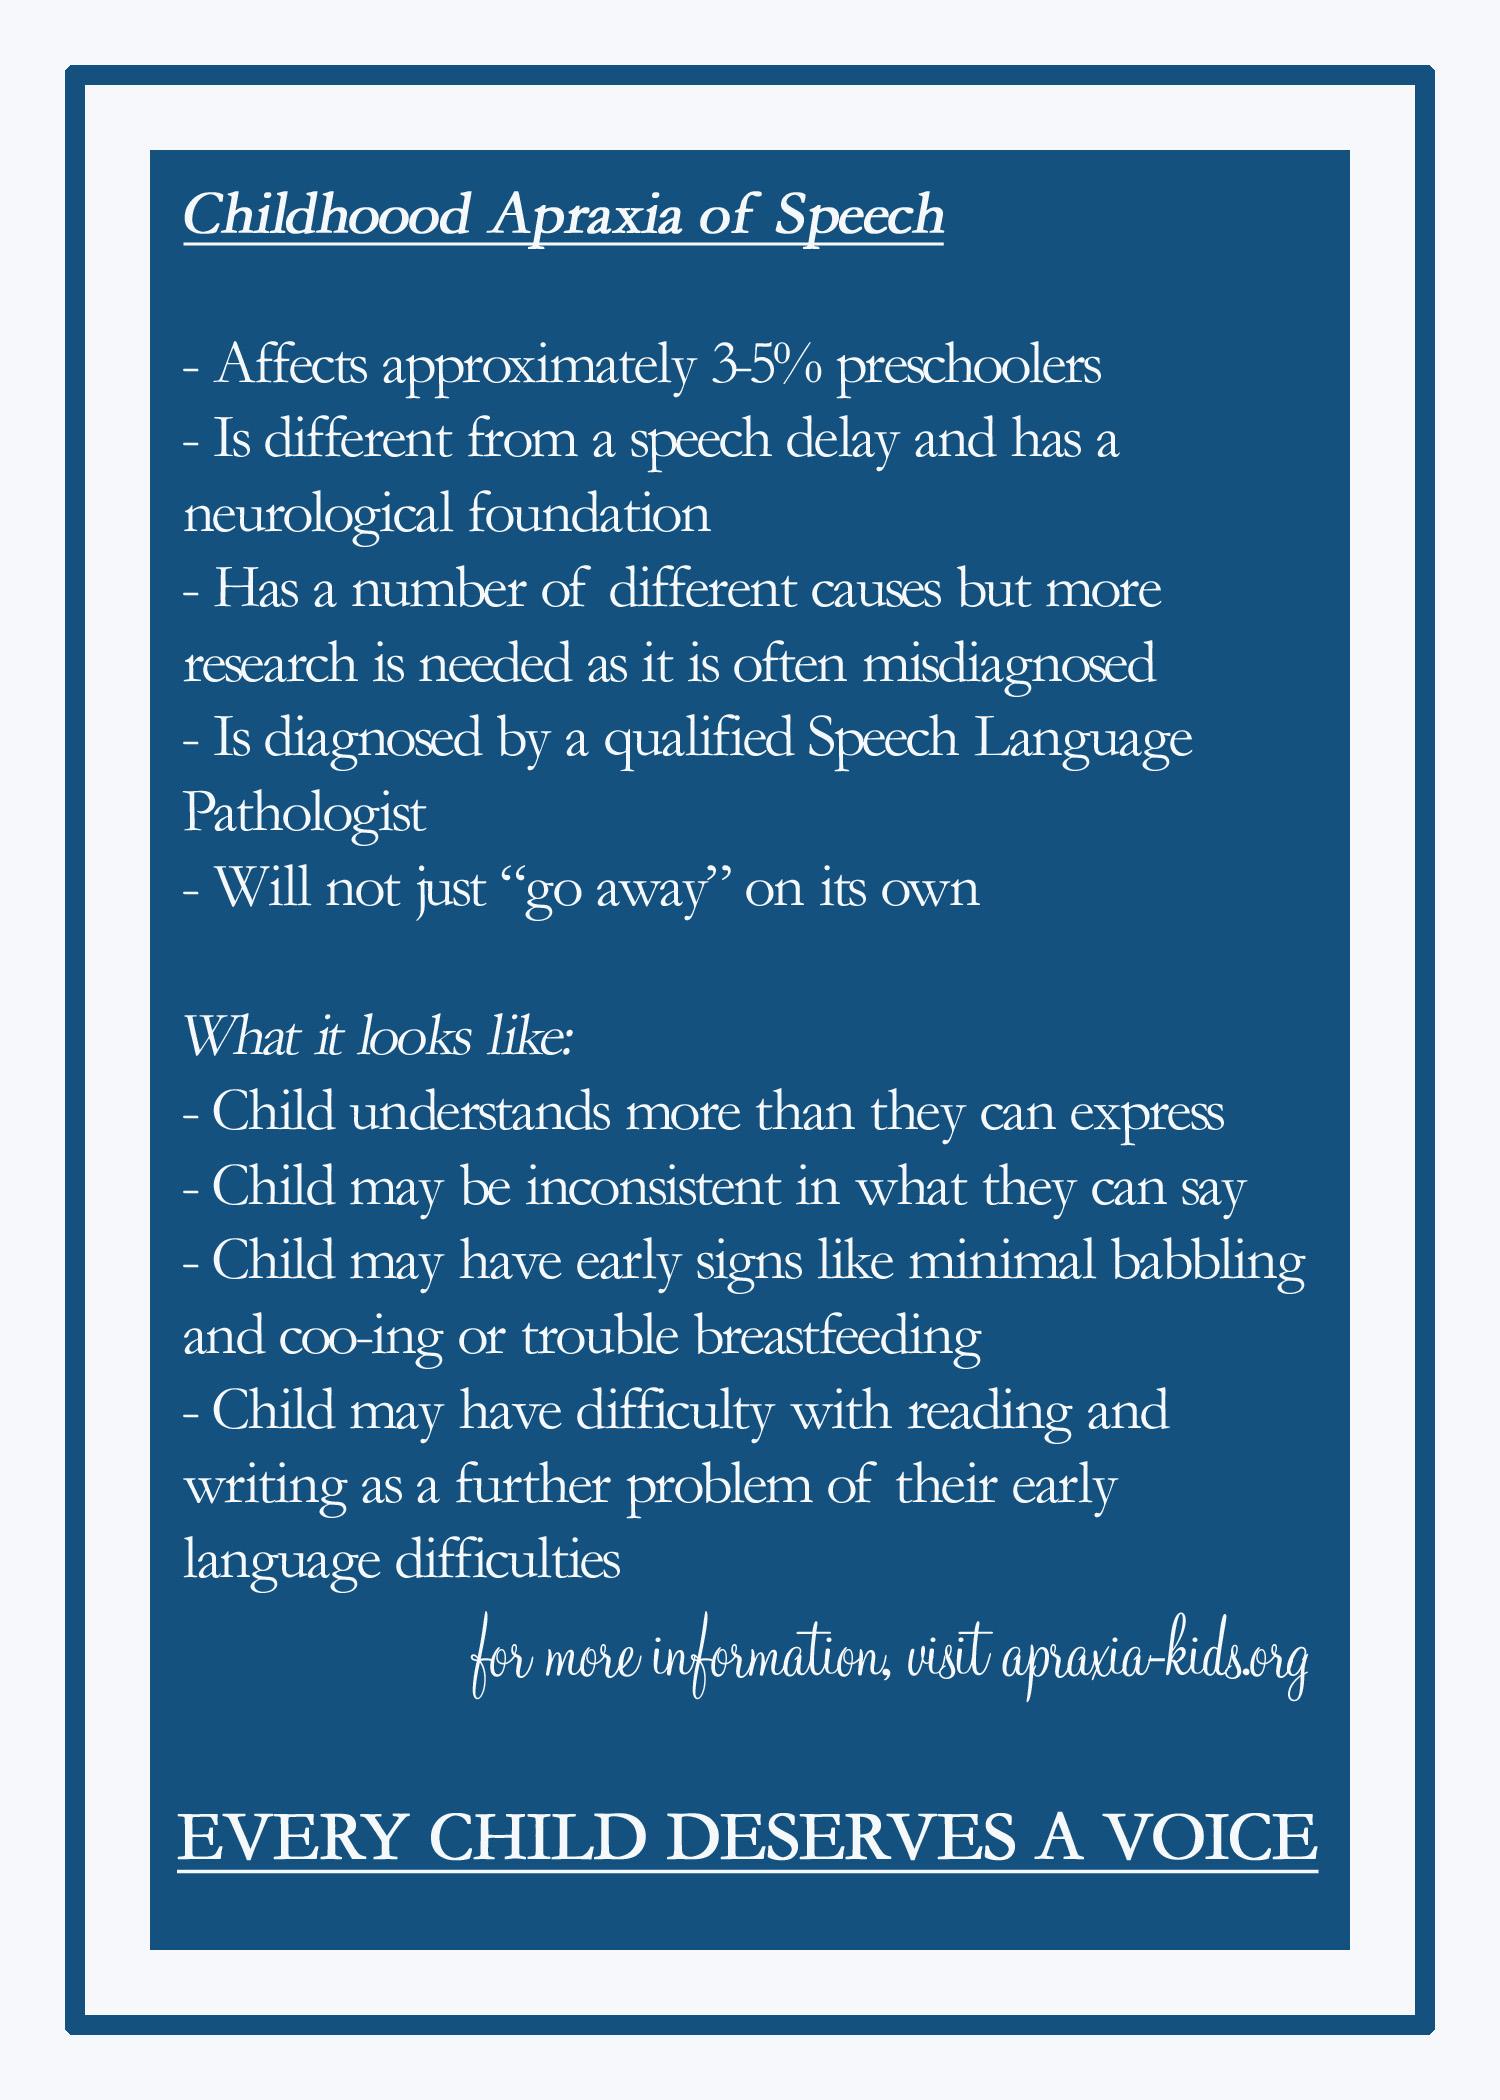 apraxia research